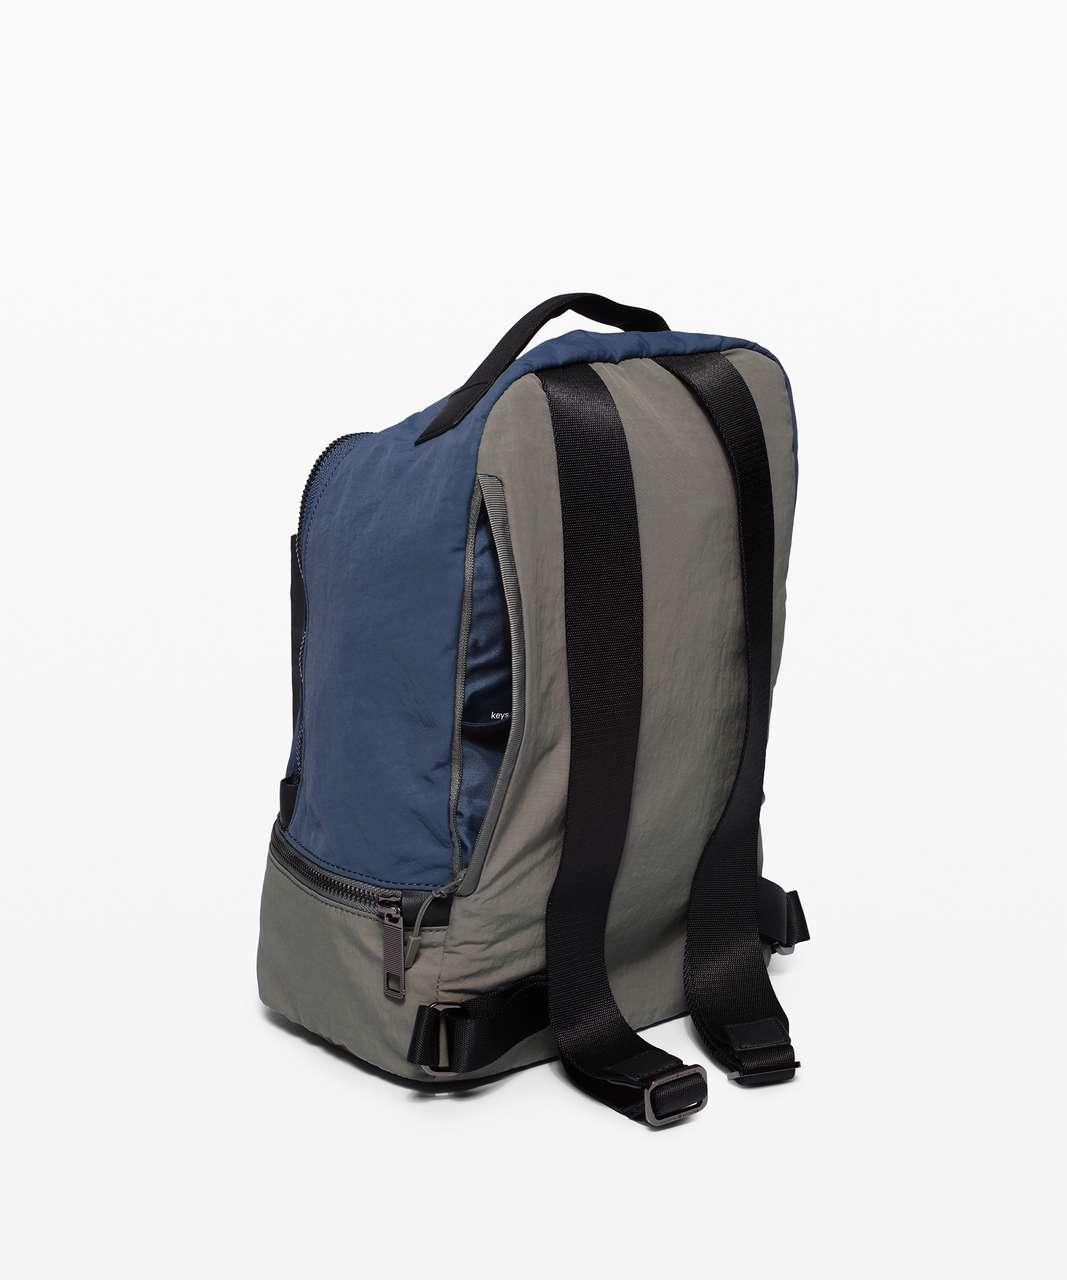 Lululemon City Adventurer Backpack Mini *10L - Iron Blue / Grey Sage